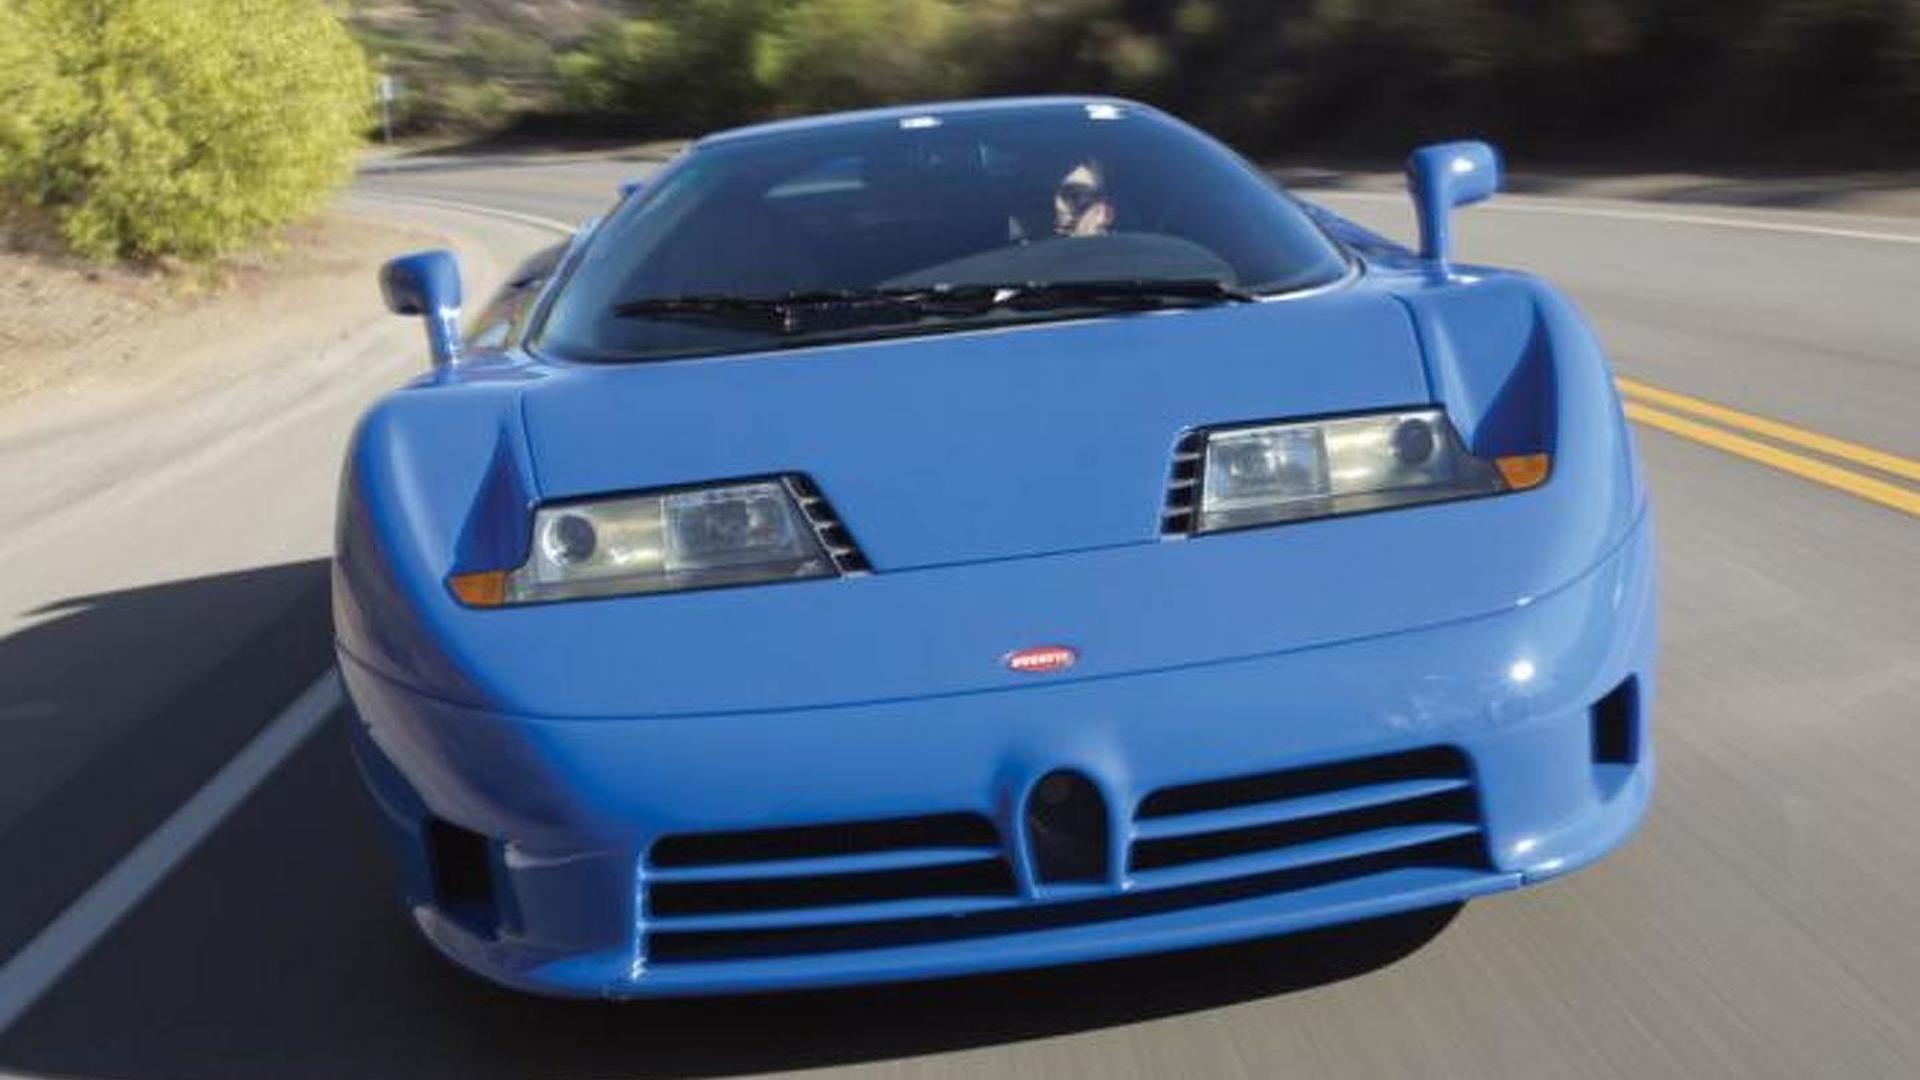 Редкая Bugatti EB110 GT 1993 года выпуска